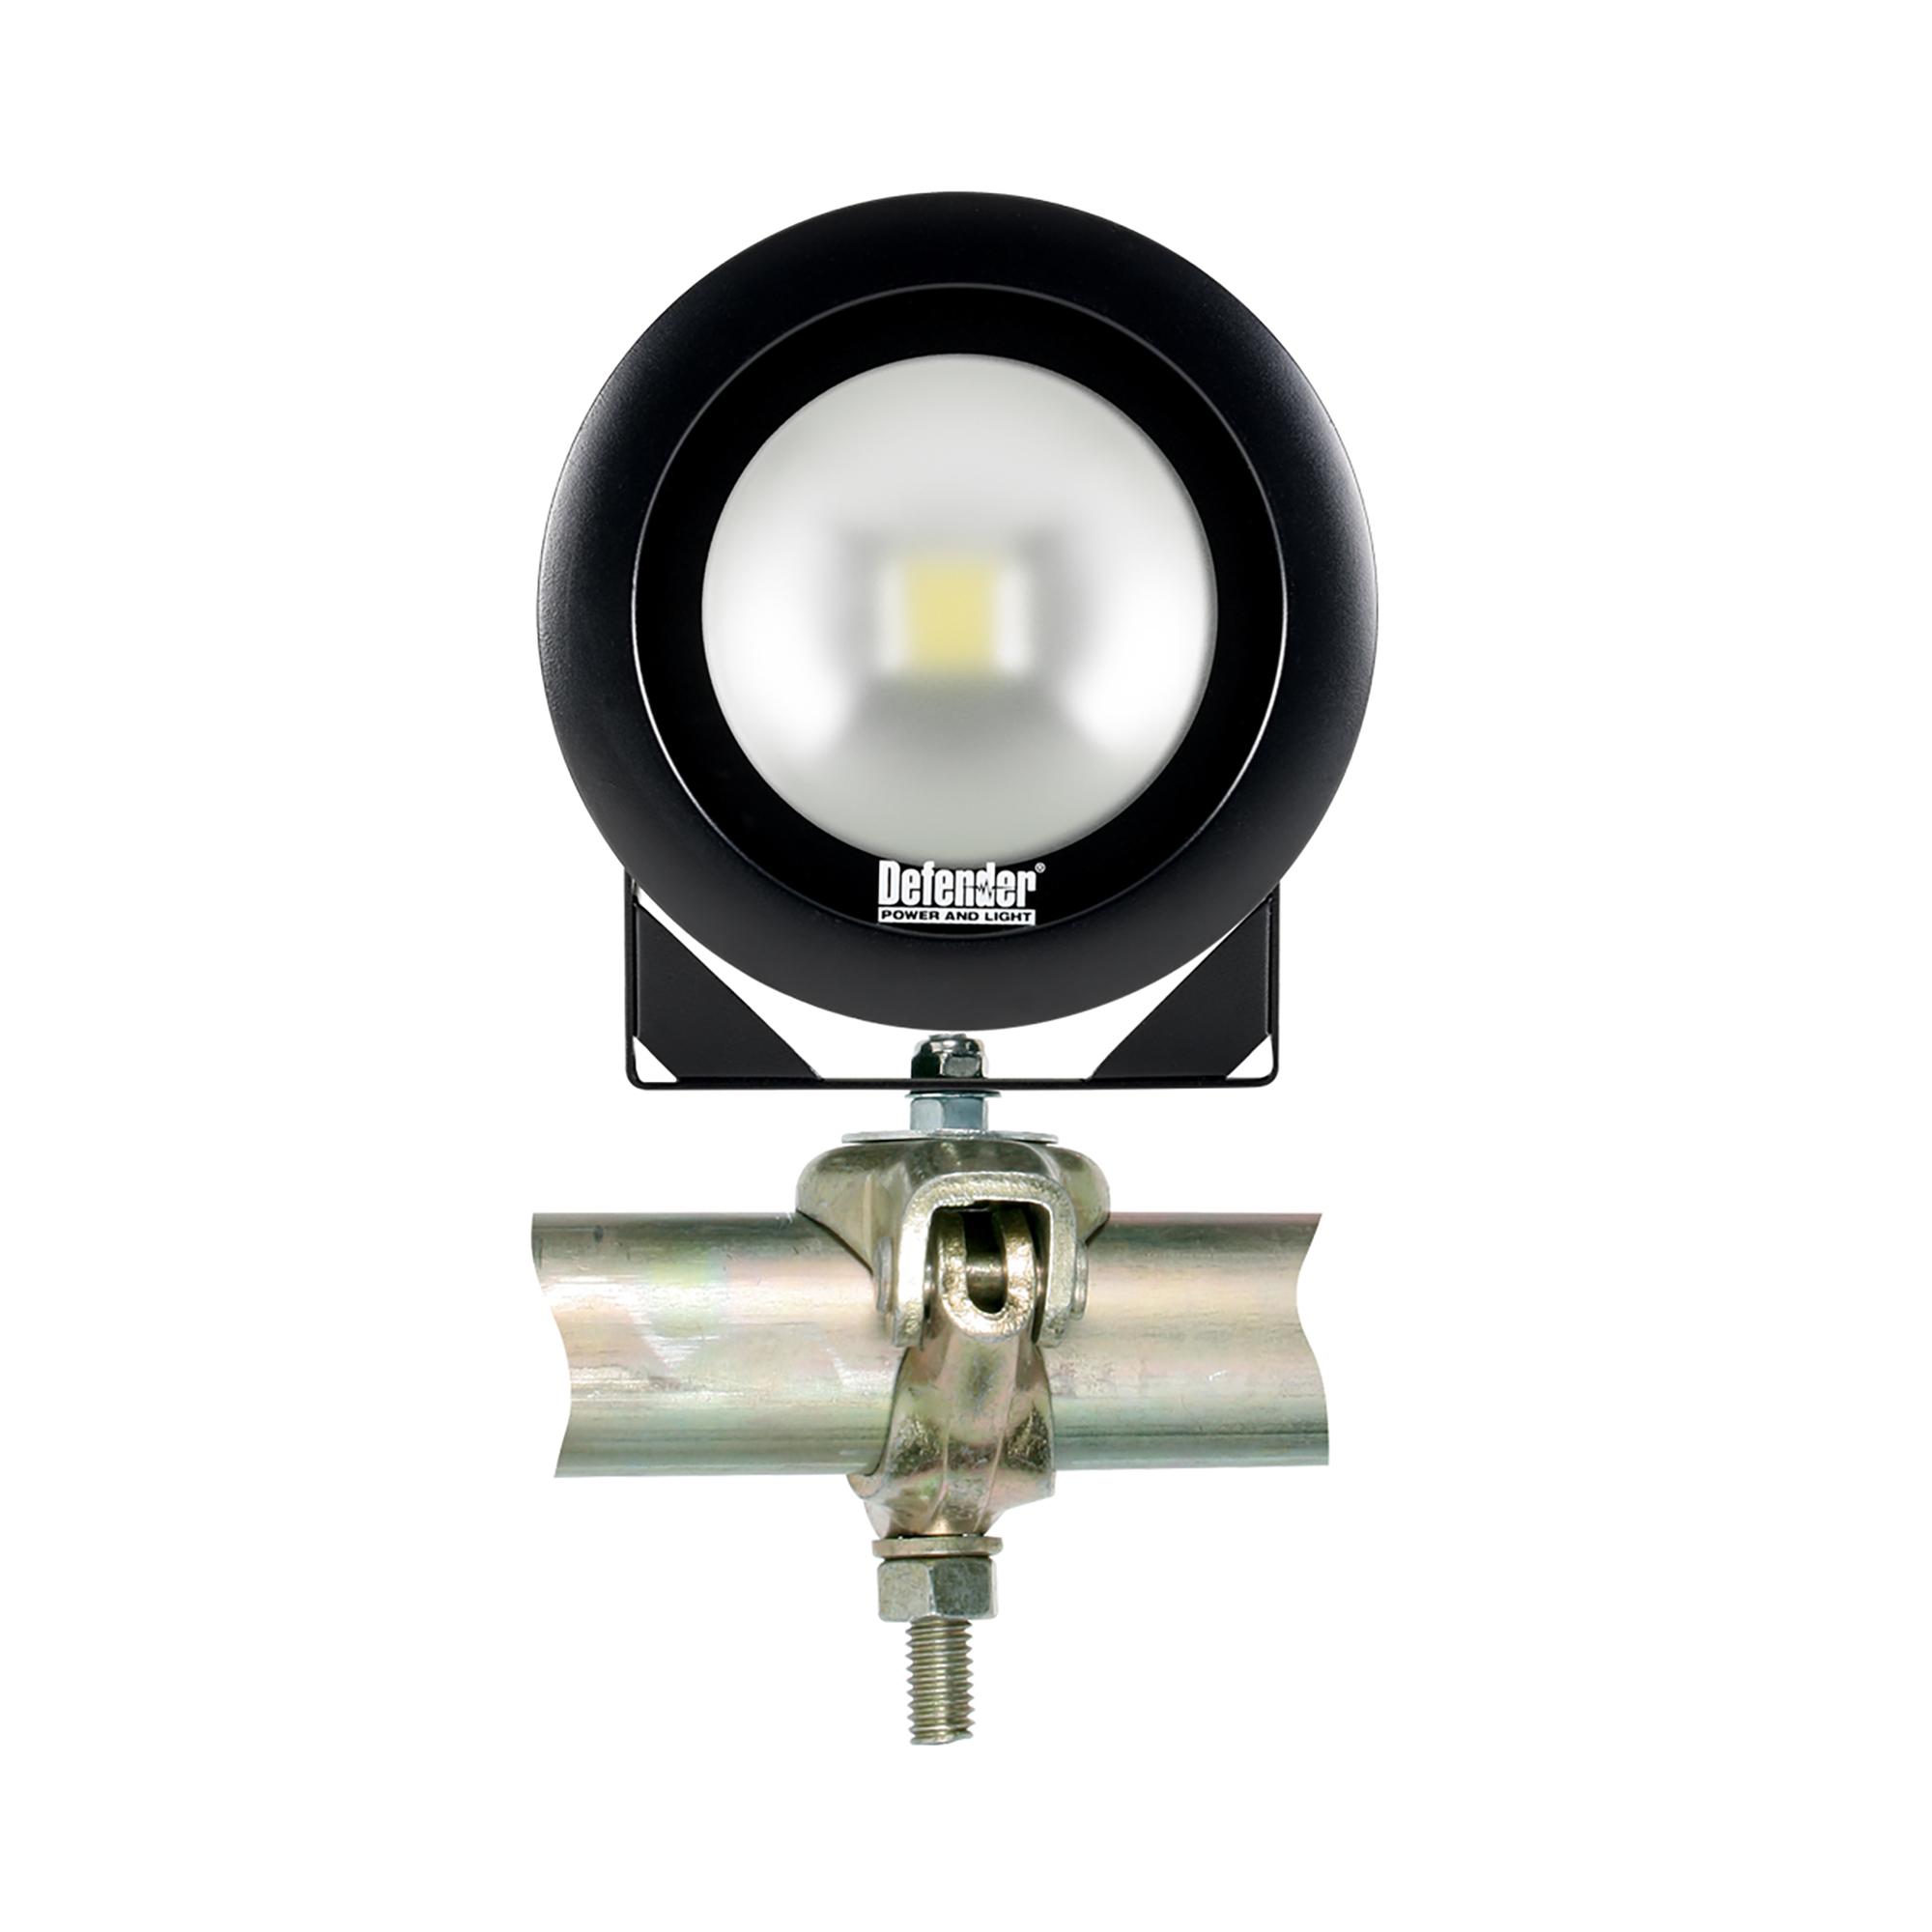 Single round Defender DF1200 LED light head mounted onto a universal scaffolding bracket